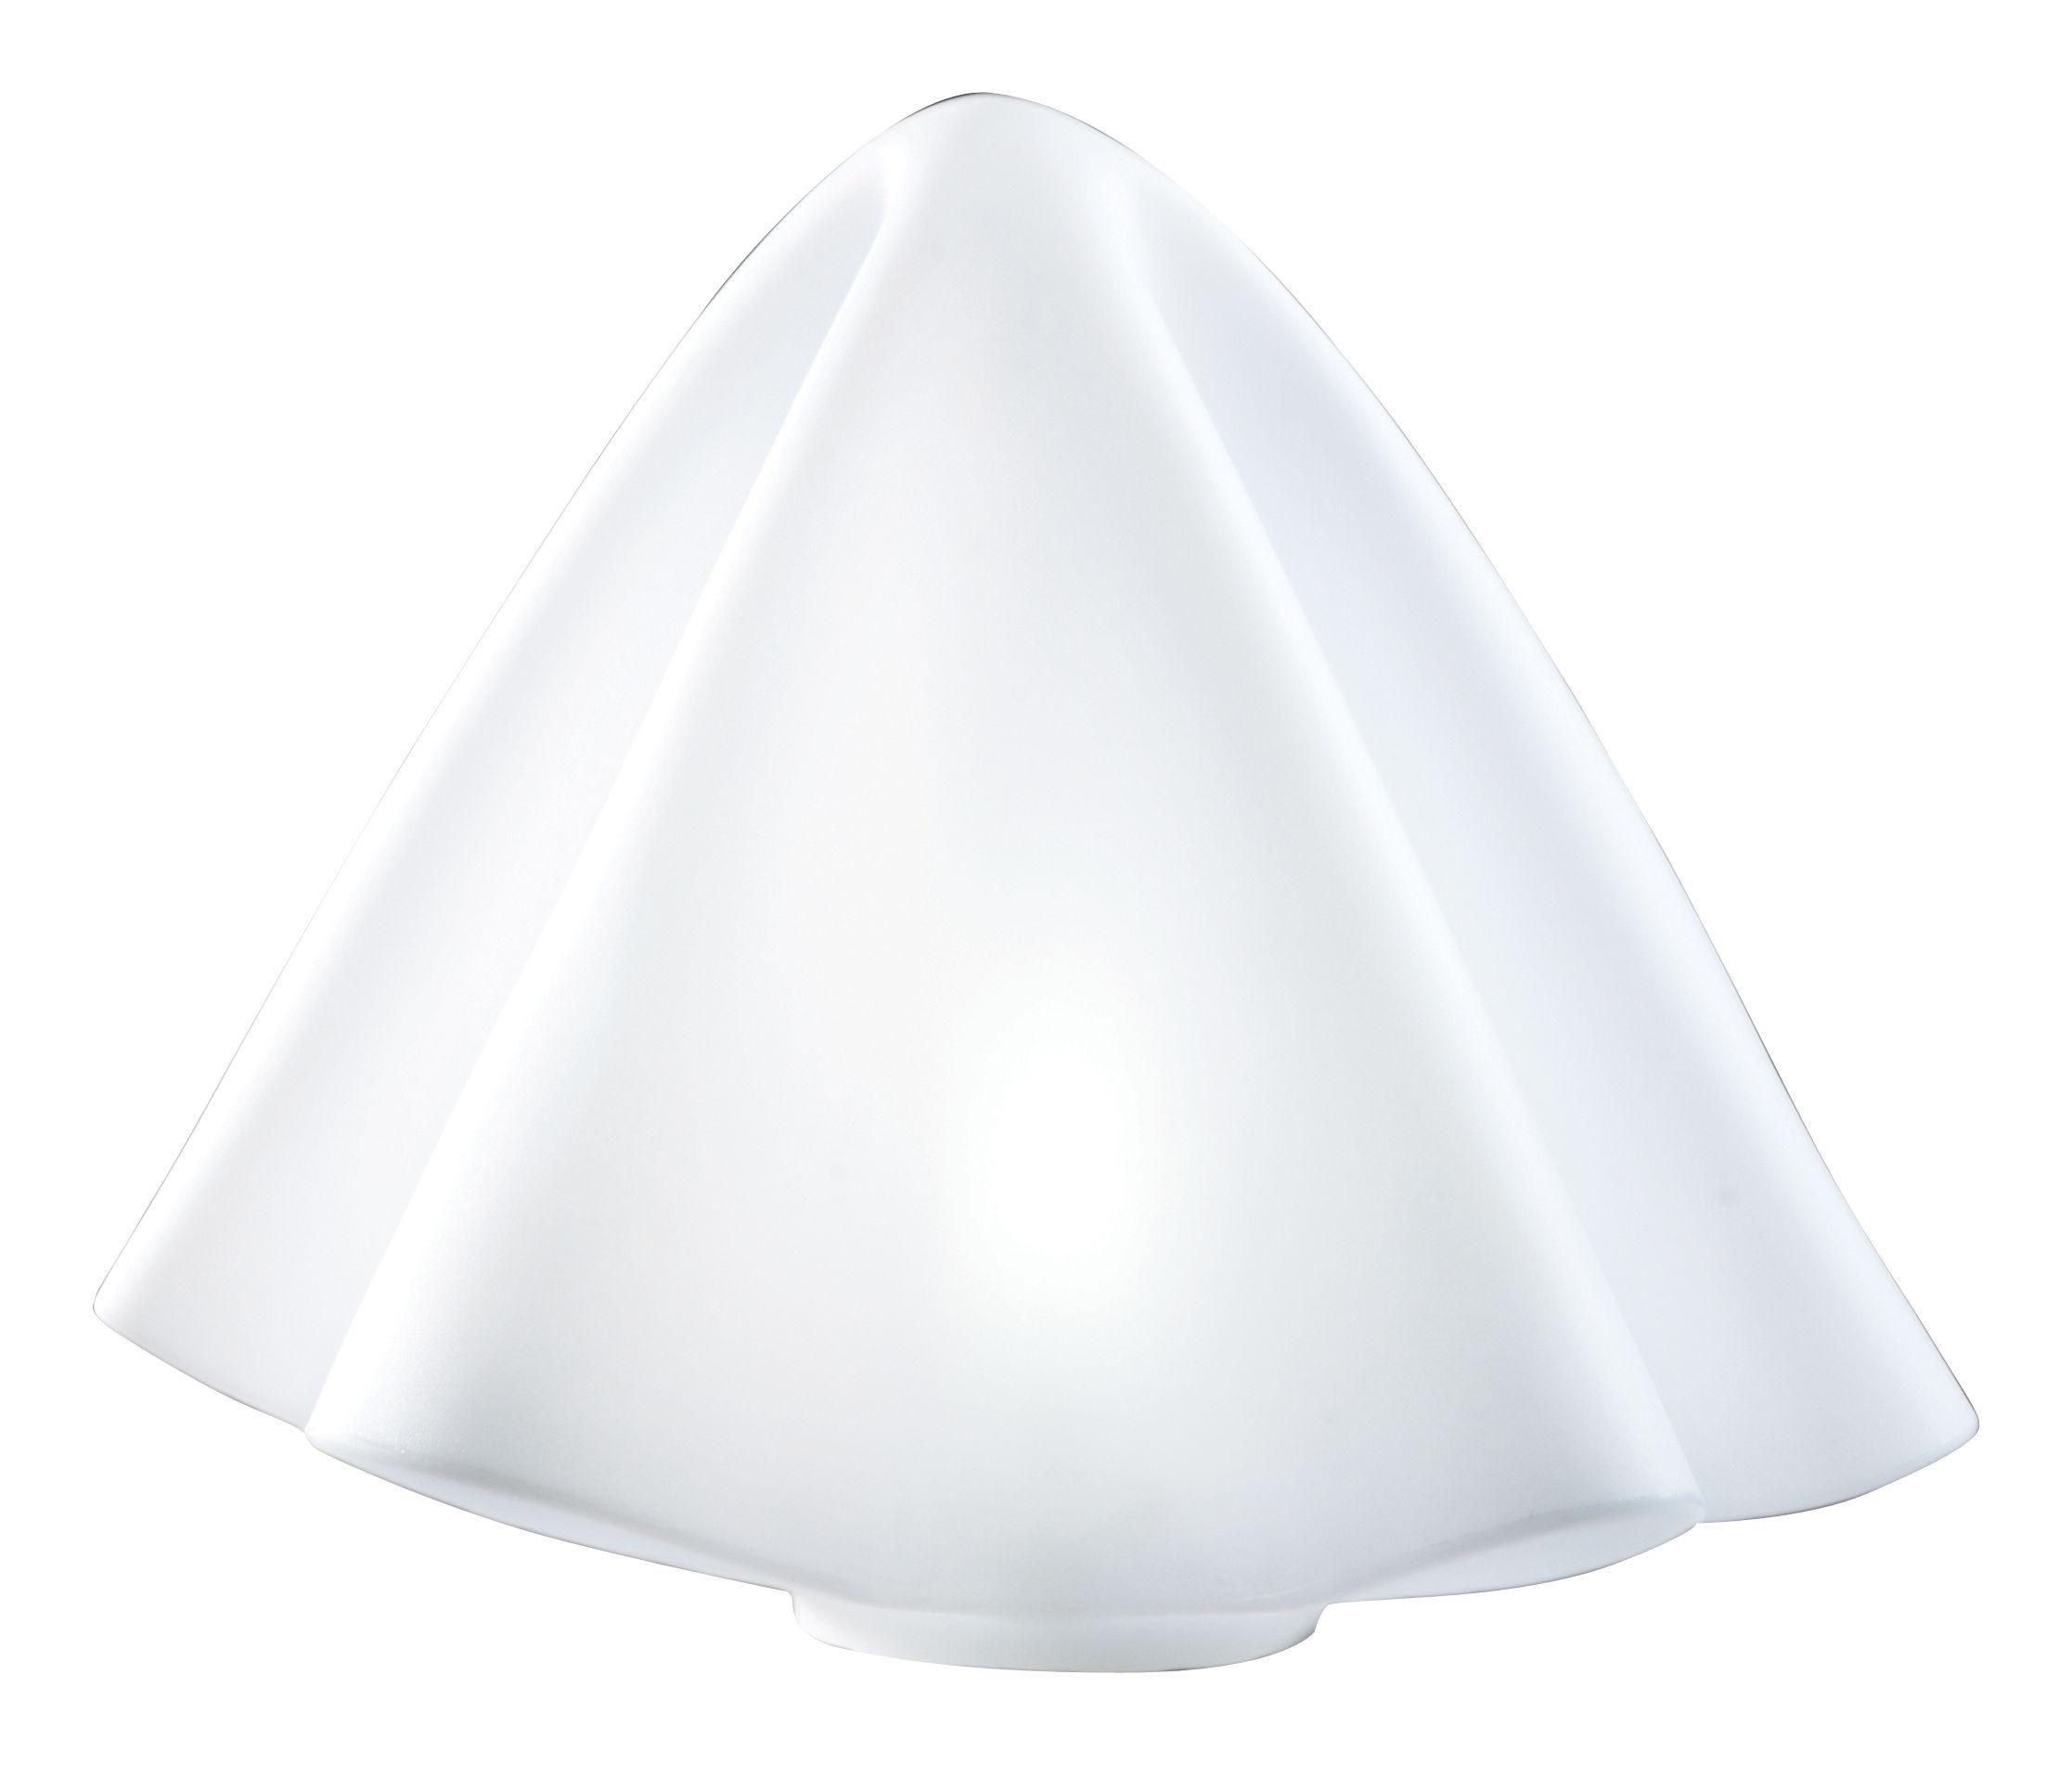 Lighting - Table Lamps - Manteau Floor lamp - H 45 cm by Slide - White - Polythene